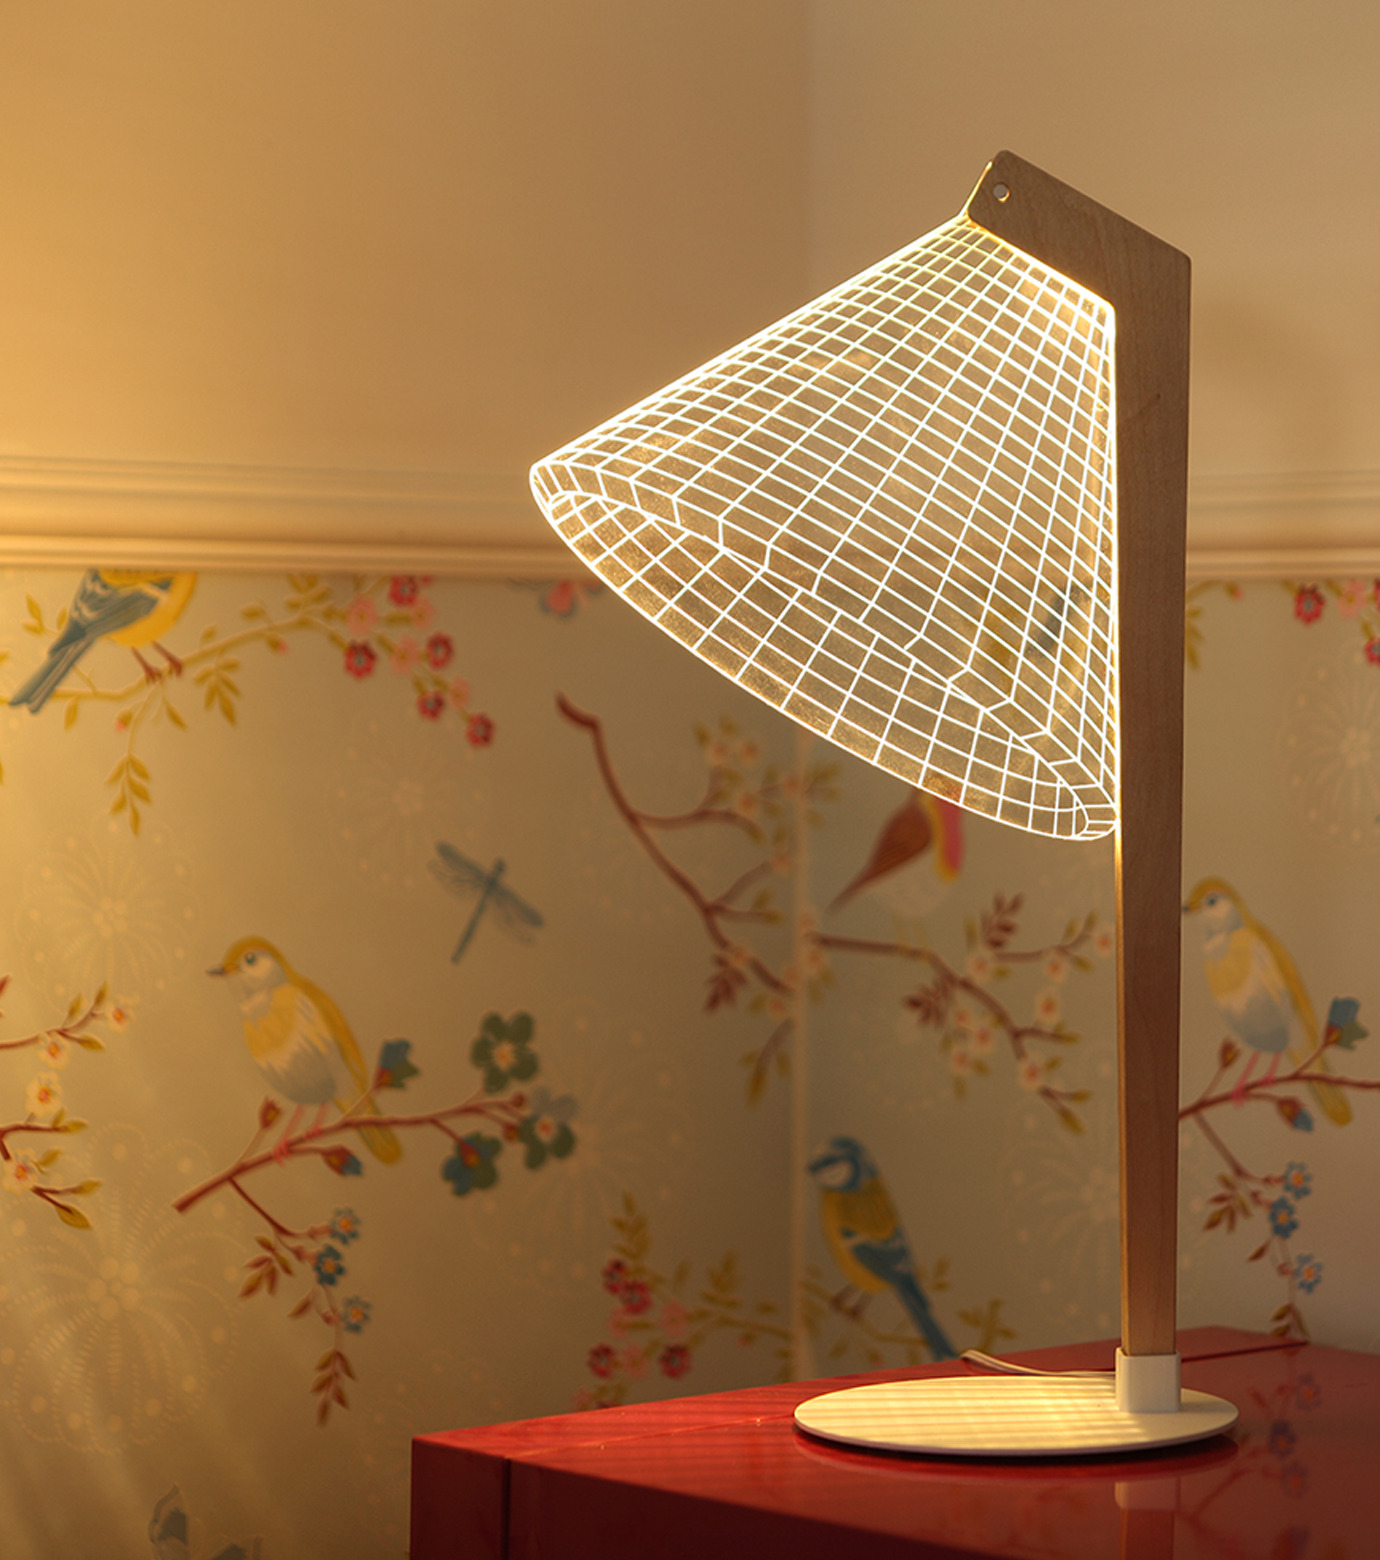 Bulbing(バルビング)のDESKi-NONE(ライト/light)-480540-0 拡大詳細画像5